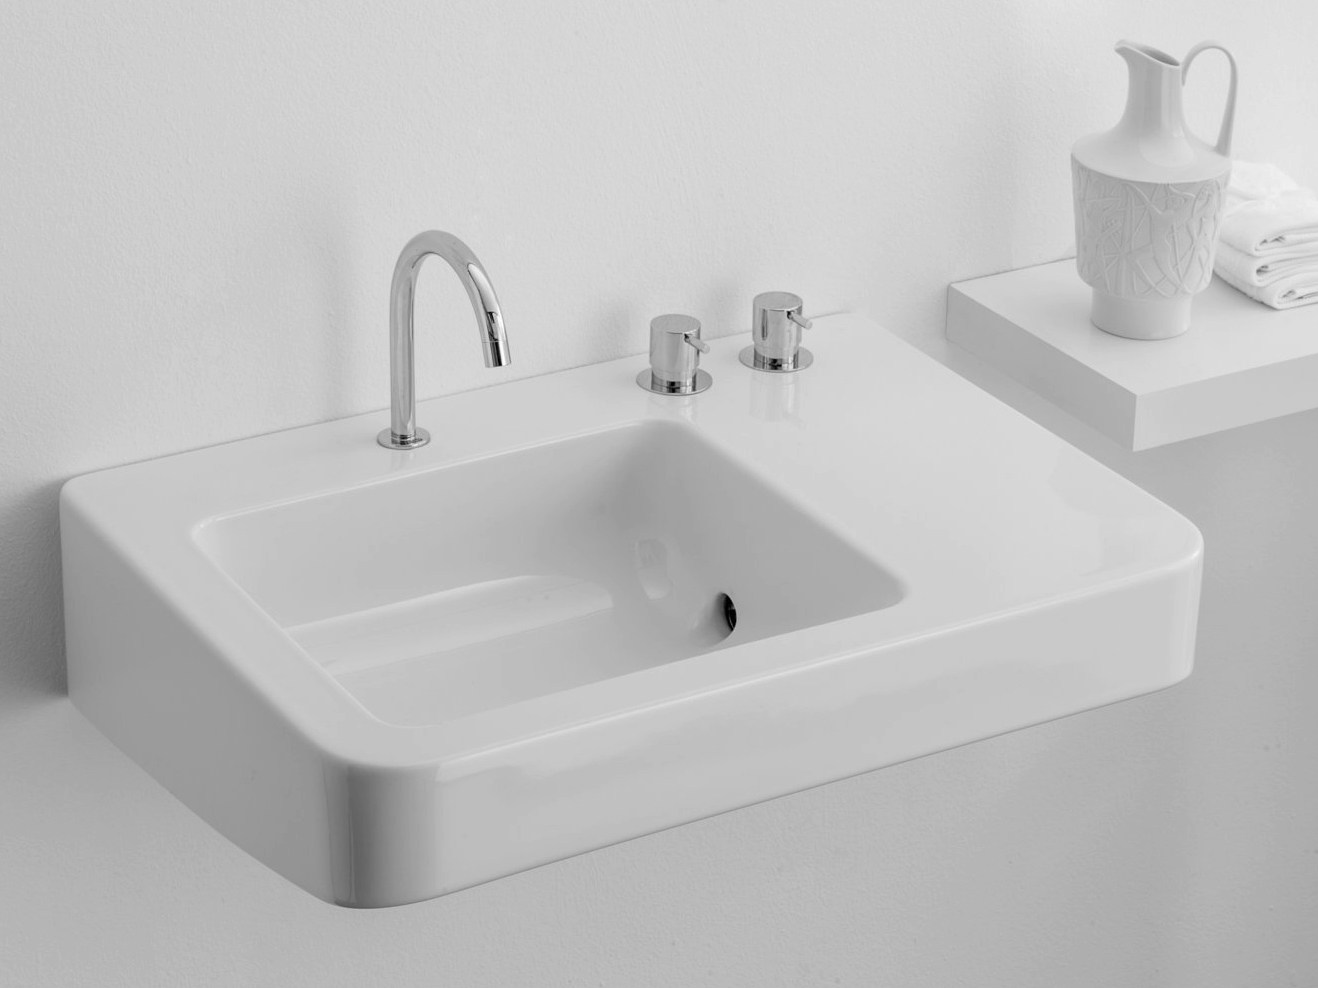 lavabo rectangulaire simple montecatini by rapsel design gio ponti. Black Bedroom Furniture Sets. Home Design Ideas